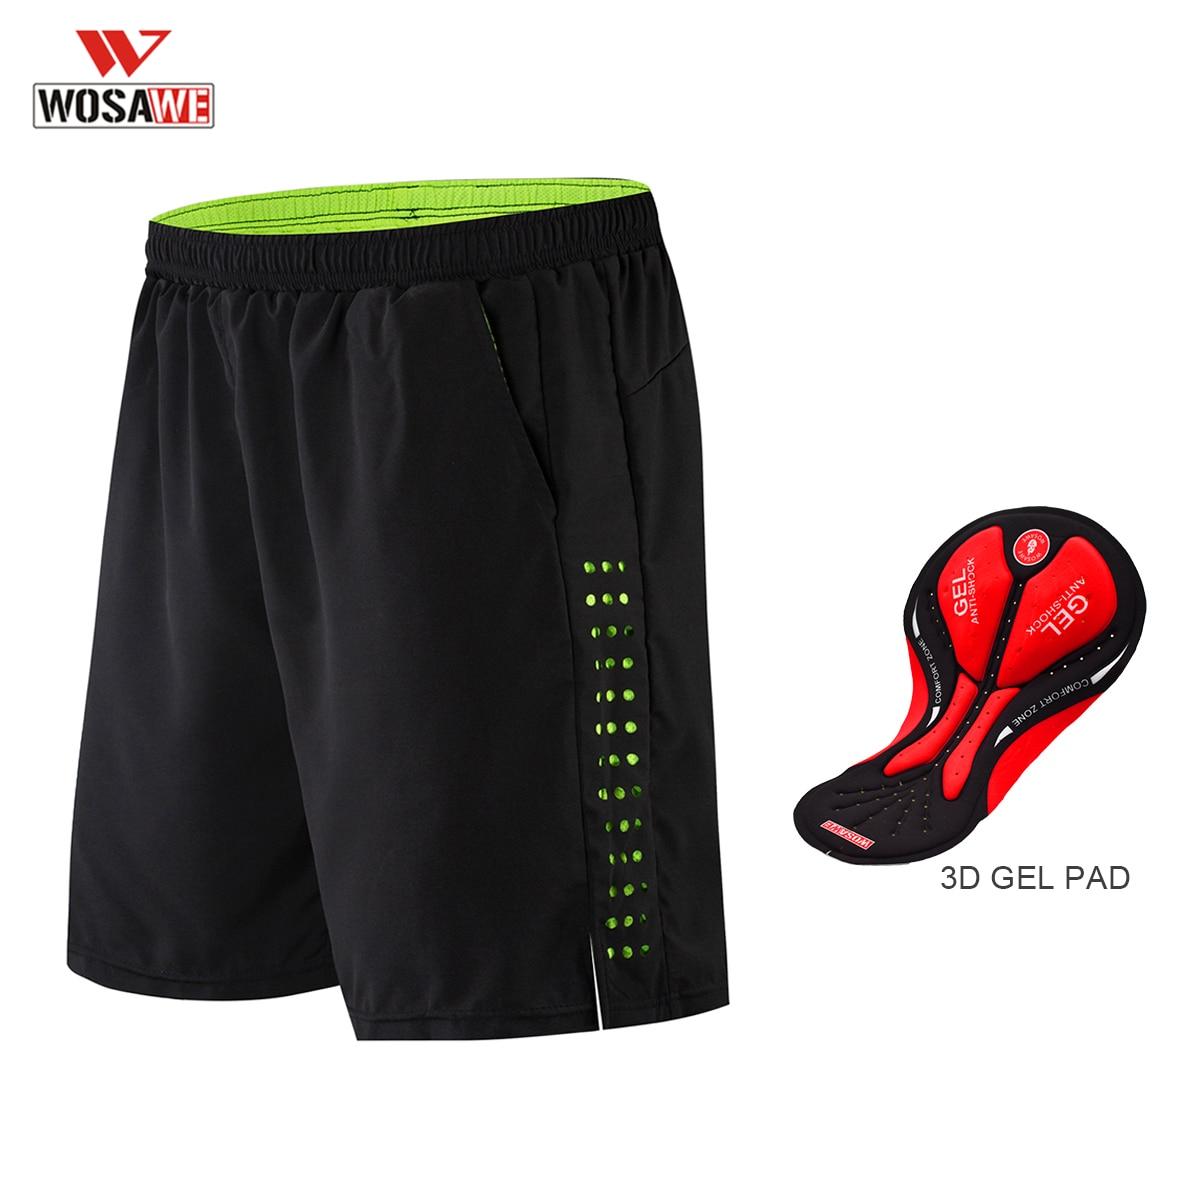 WOSAWE DH Shorts Pants Spodenki Bermuda Men Waterproof Shorts 3D GEL Silicone Pad For ATV Bici DH MX MTB Broek Shorts Bike Short